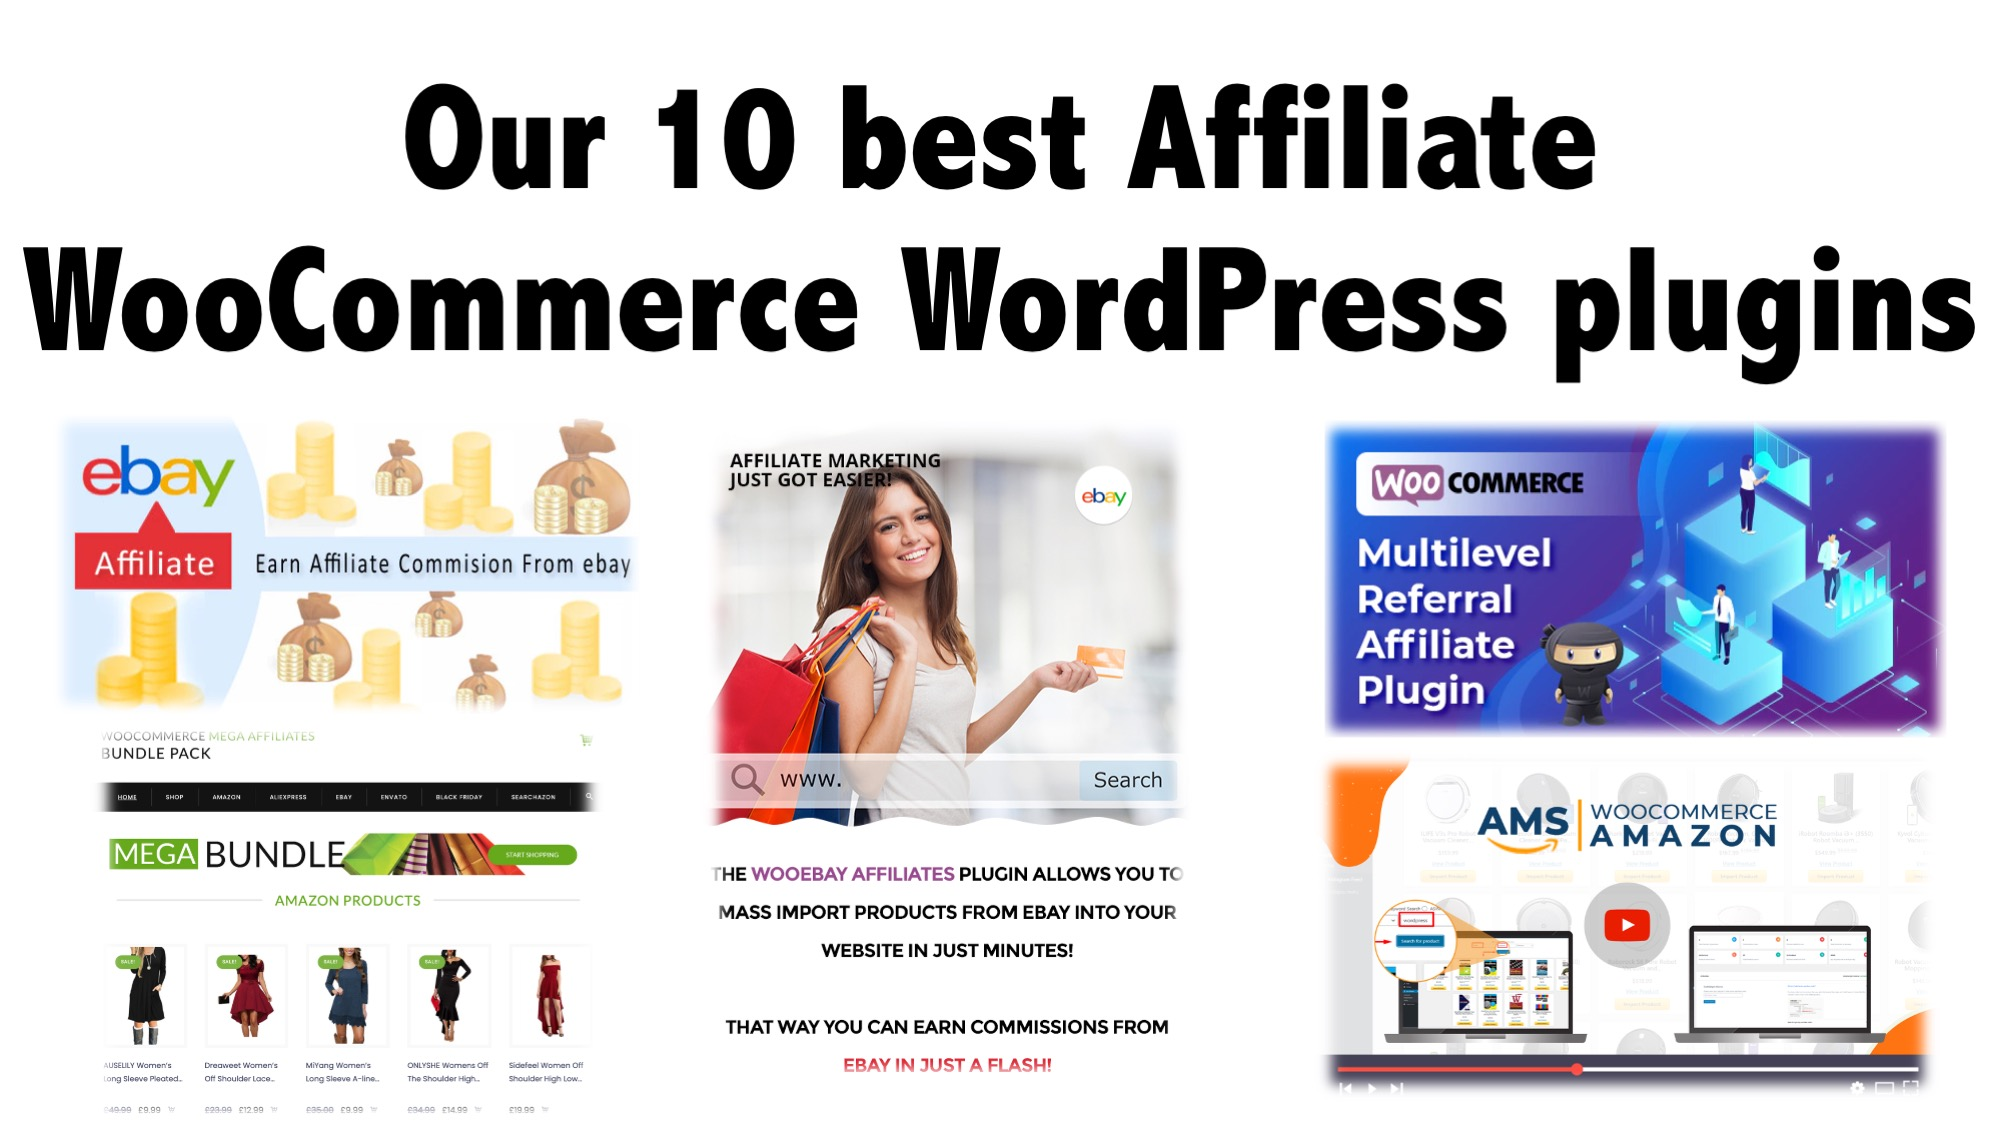 Our 10 best Affiliate WooCommerce WordPress plugins